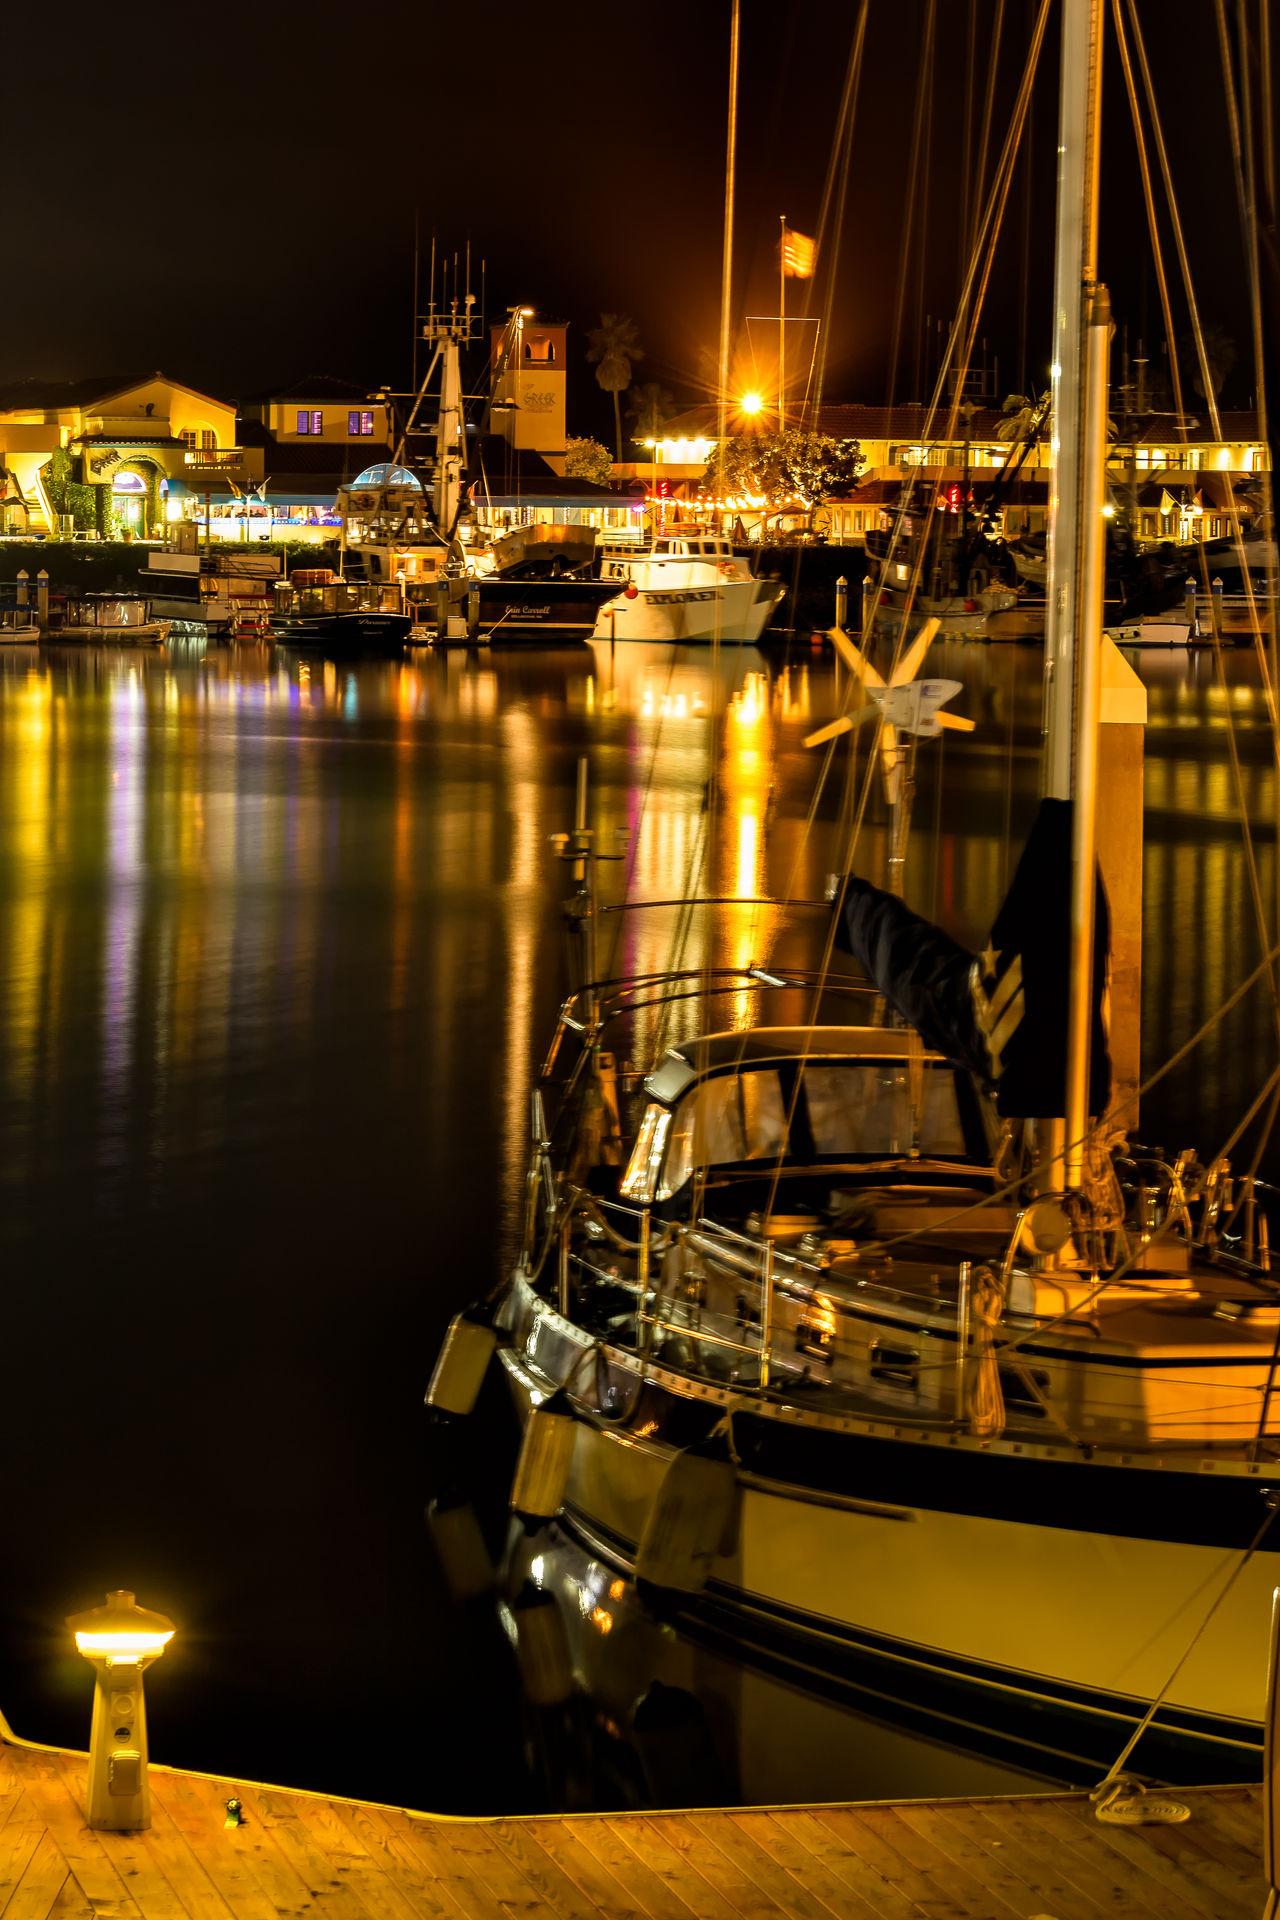 Aglow Boat Boats Boats And Water Boats⛵️ Harbor Harbors Harborside Long Exposure Longexposure Night Night Lights Night Photography Night View Nightphotography Nightshot Ventura Ventura Ca VenturaCounty